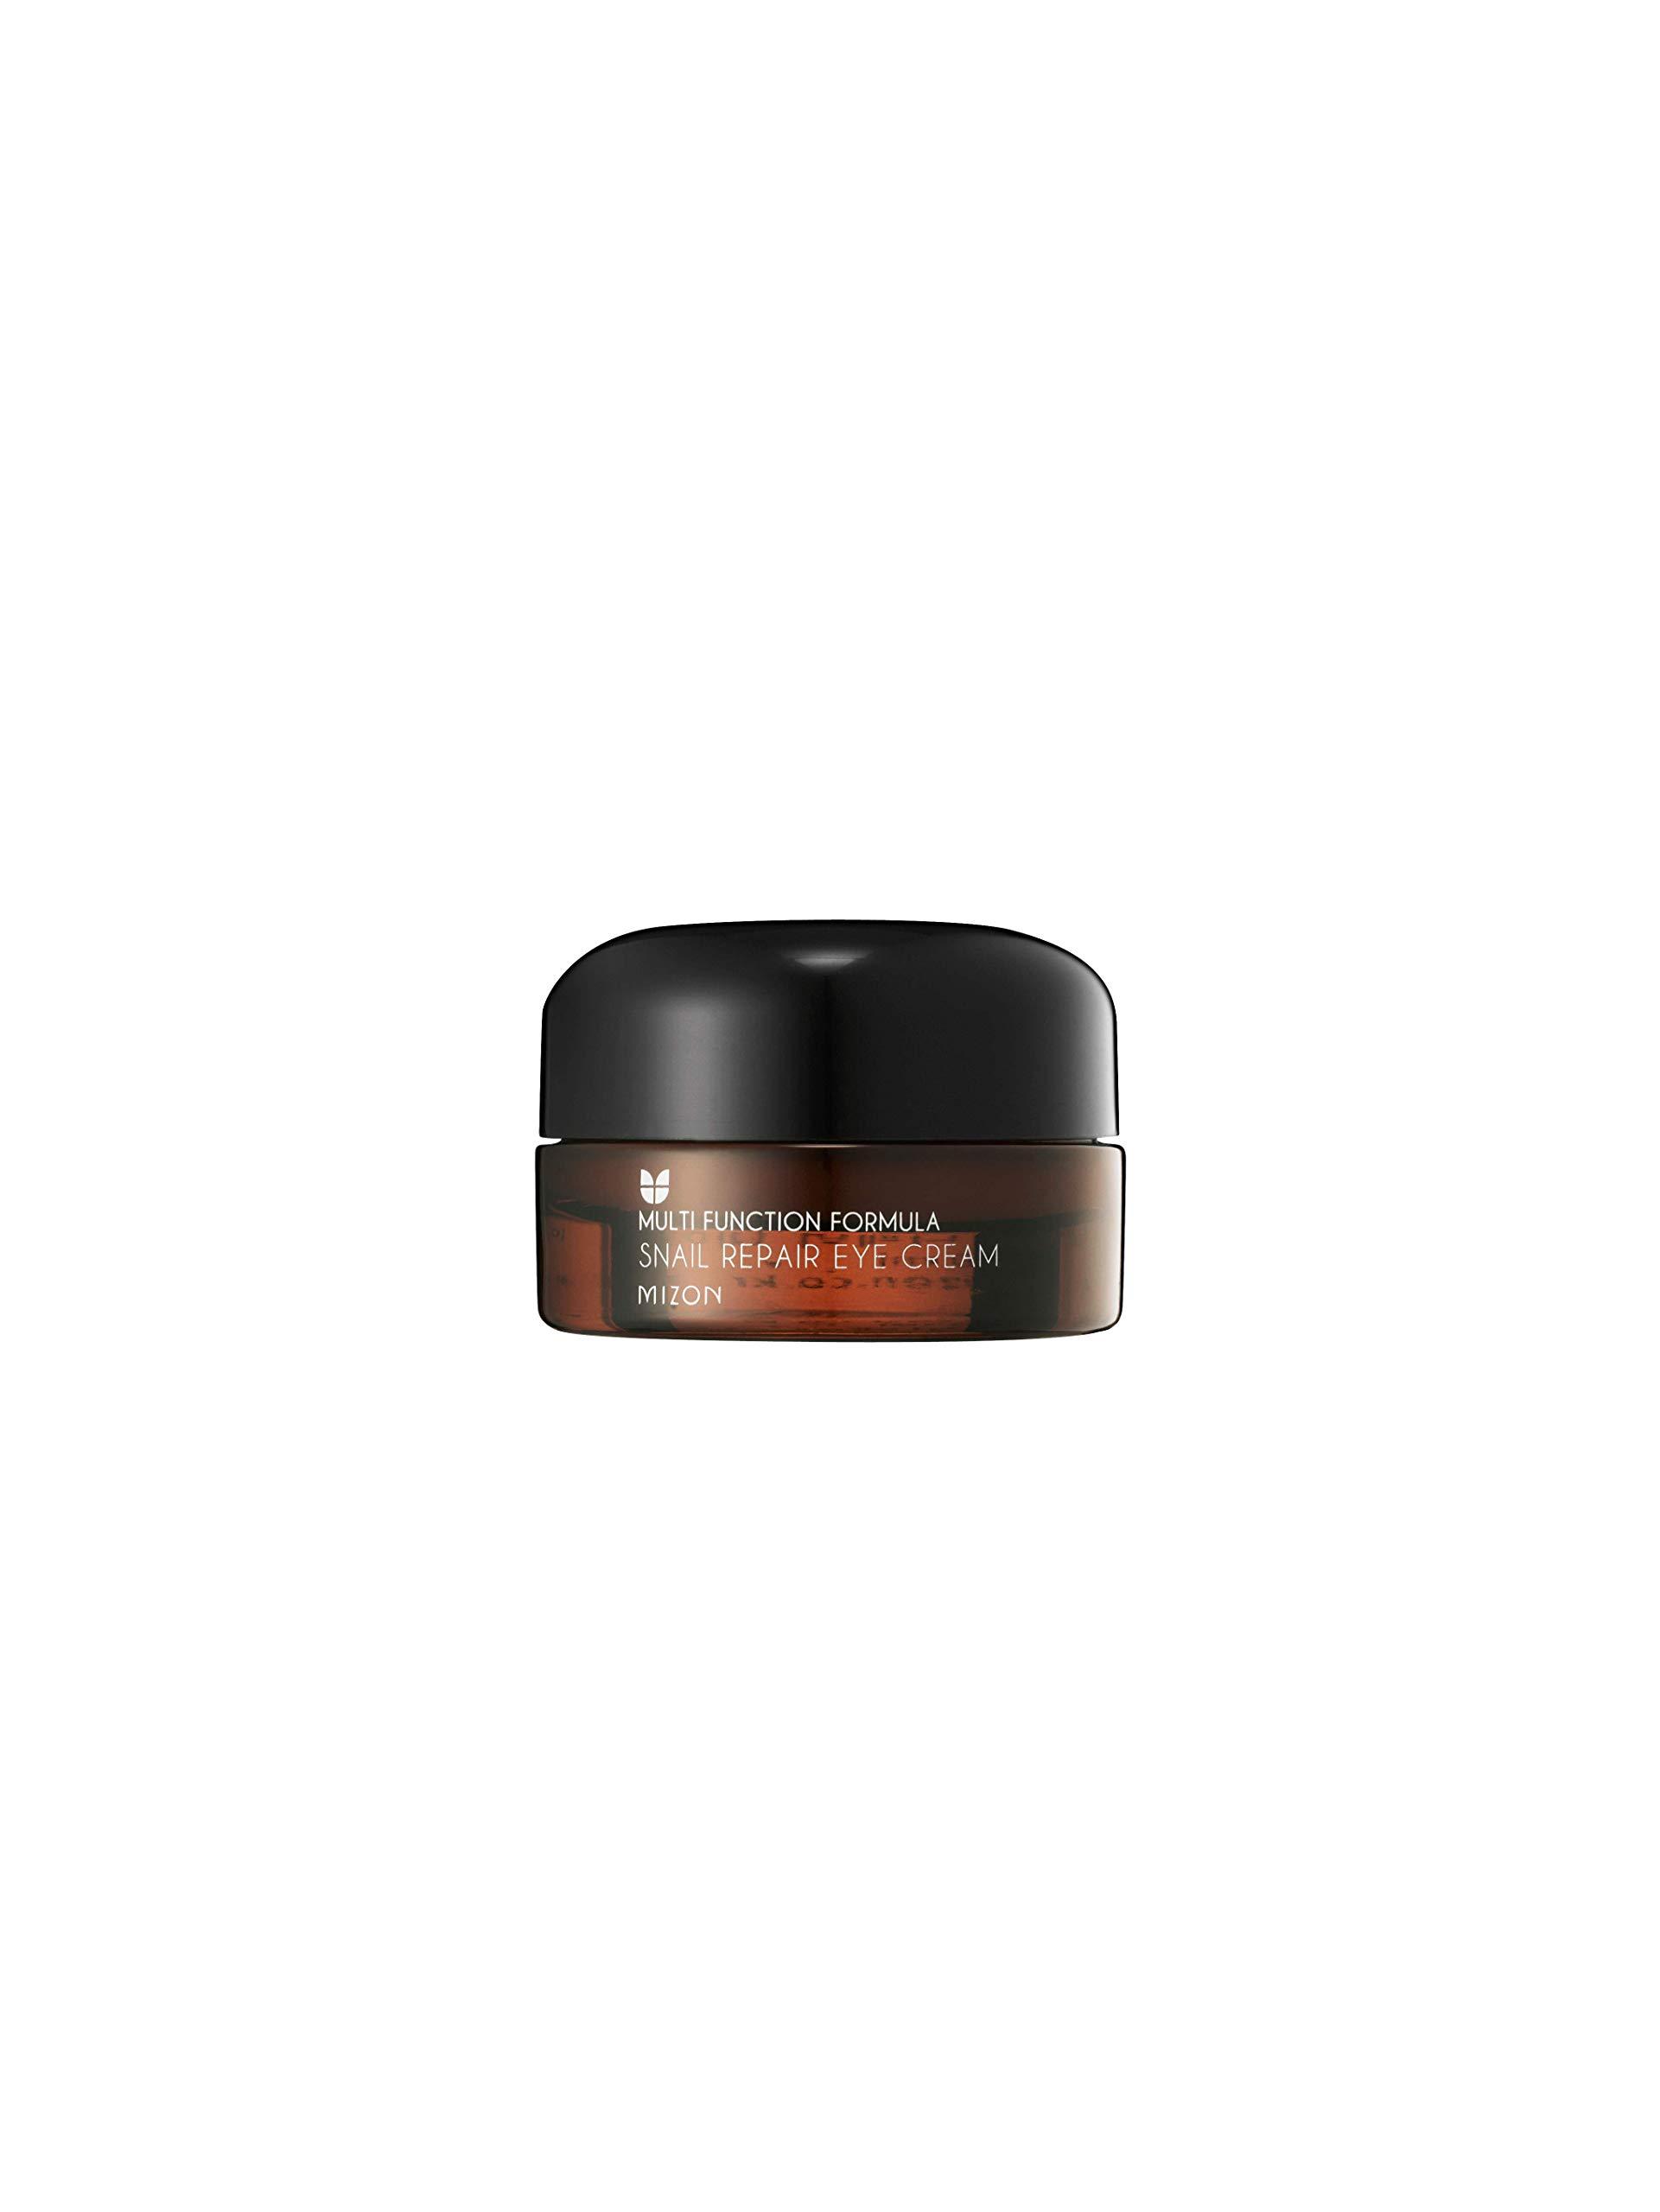 [MIZON] Snail Repair Eye Cream (0.84 fl. oz / 25ml), Eye Cream for Dark Circles and Wrinkle Care